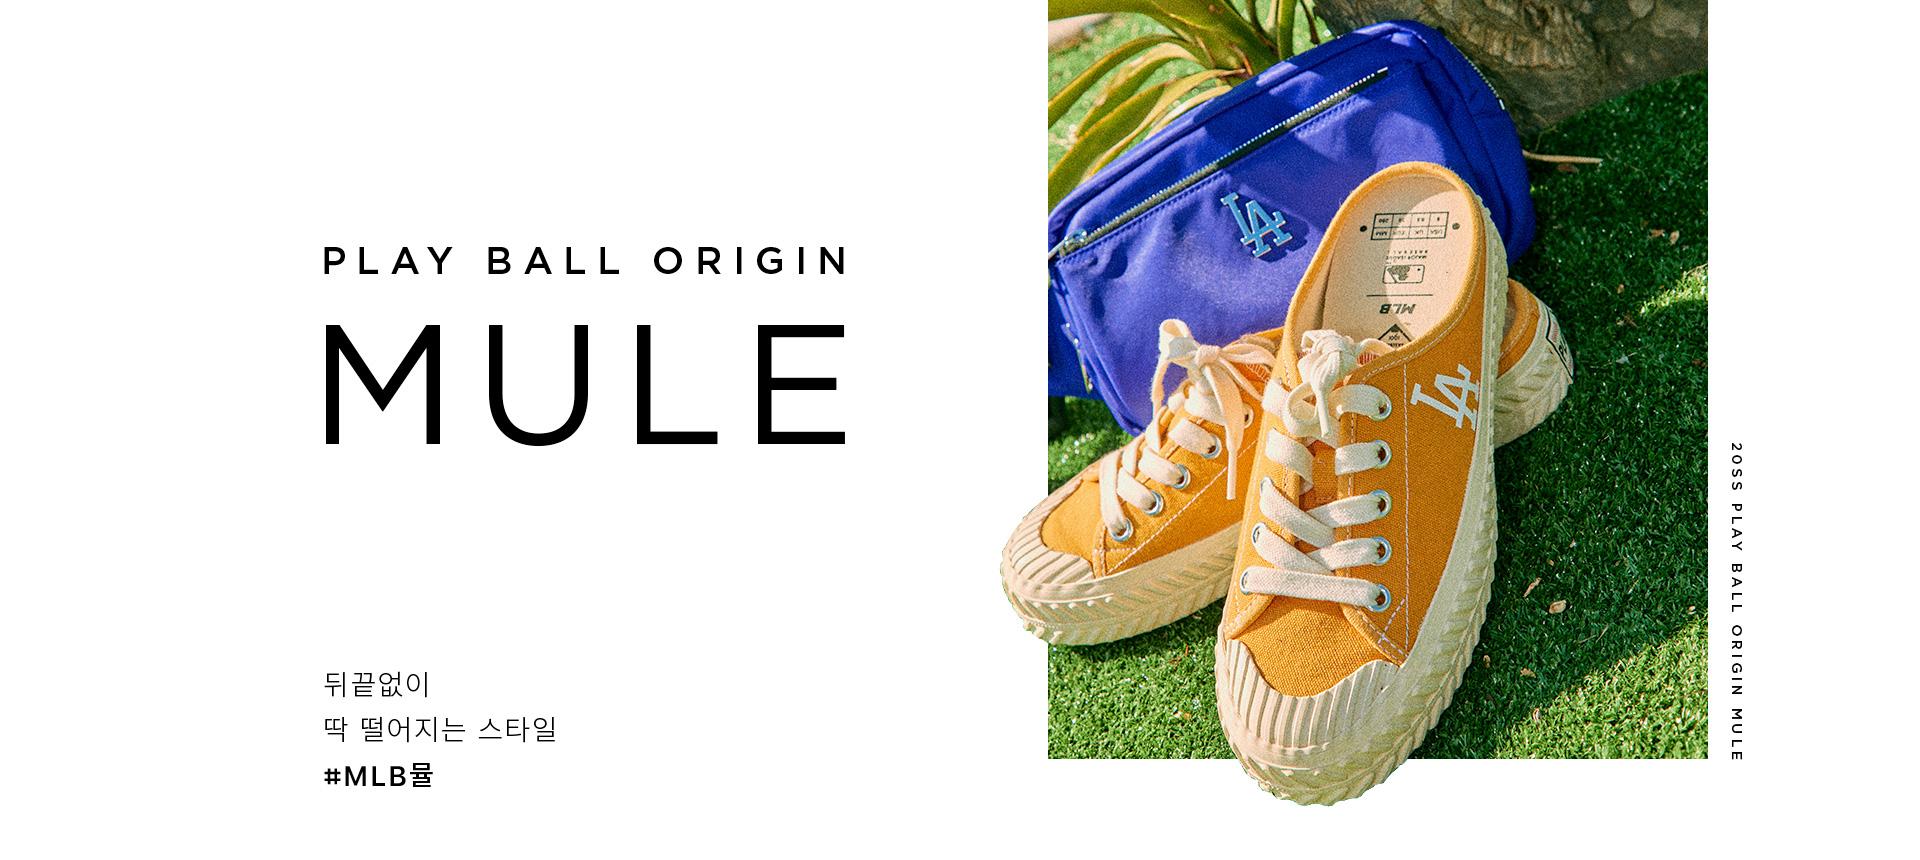 play ball origin mule